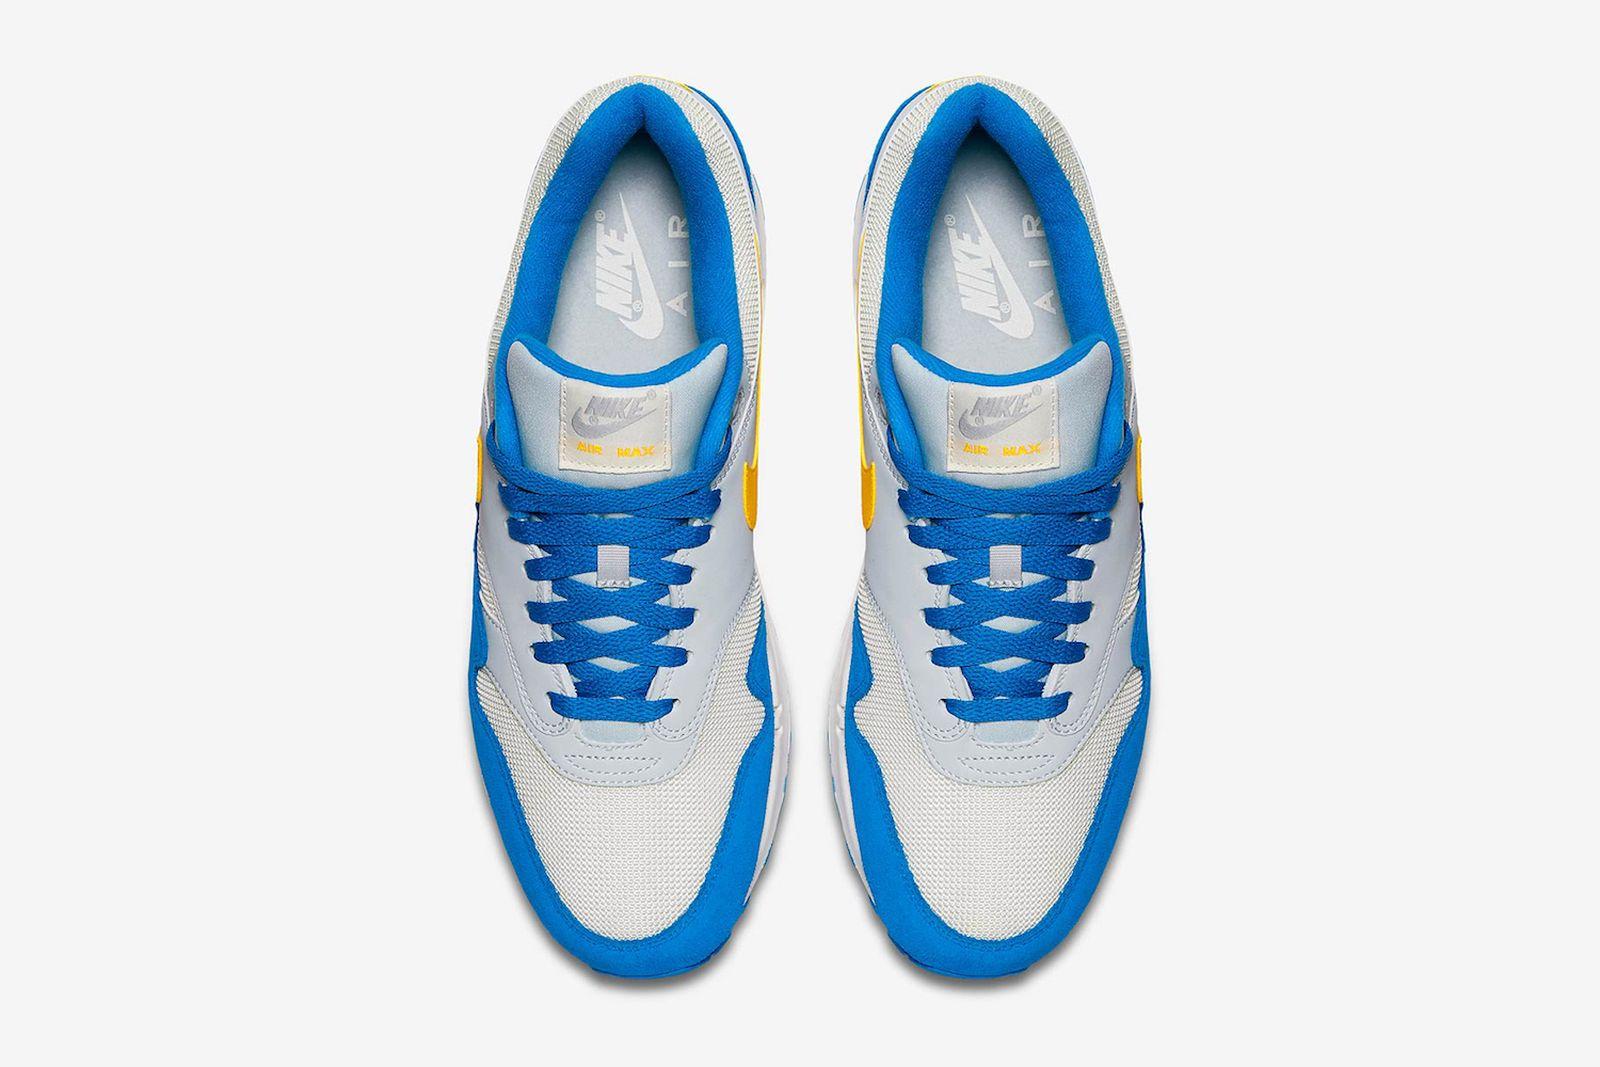 nike air max 1 amarillo signal blue release date price info